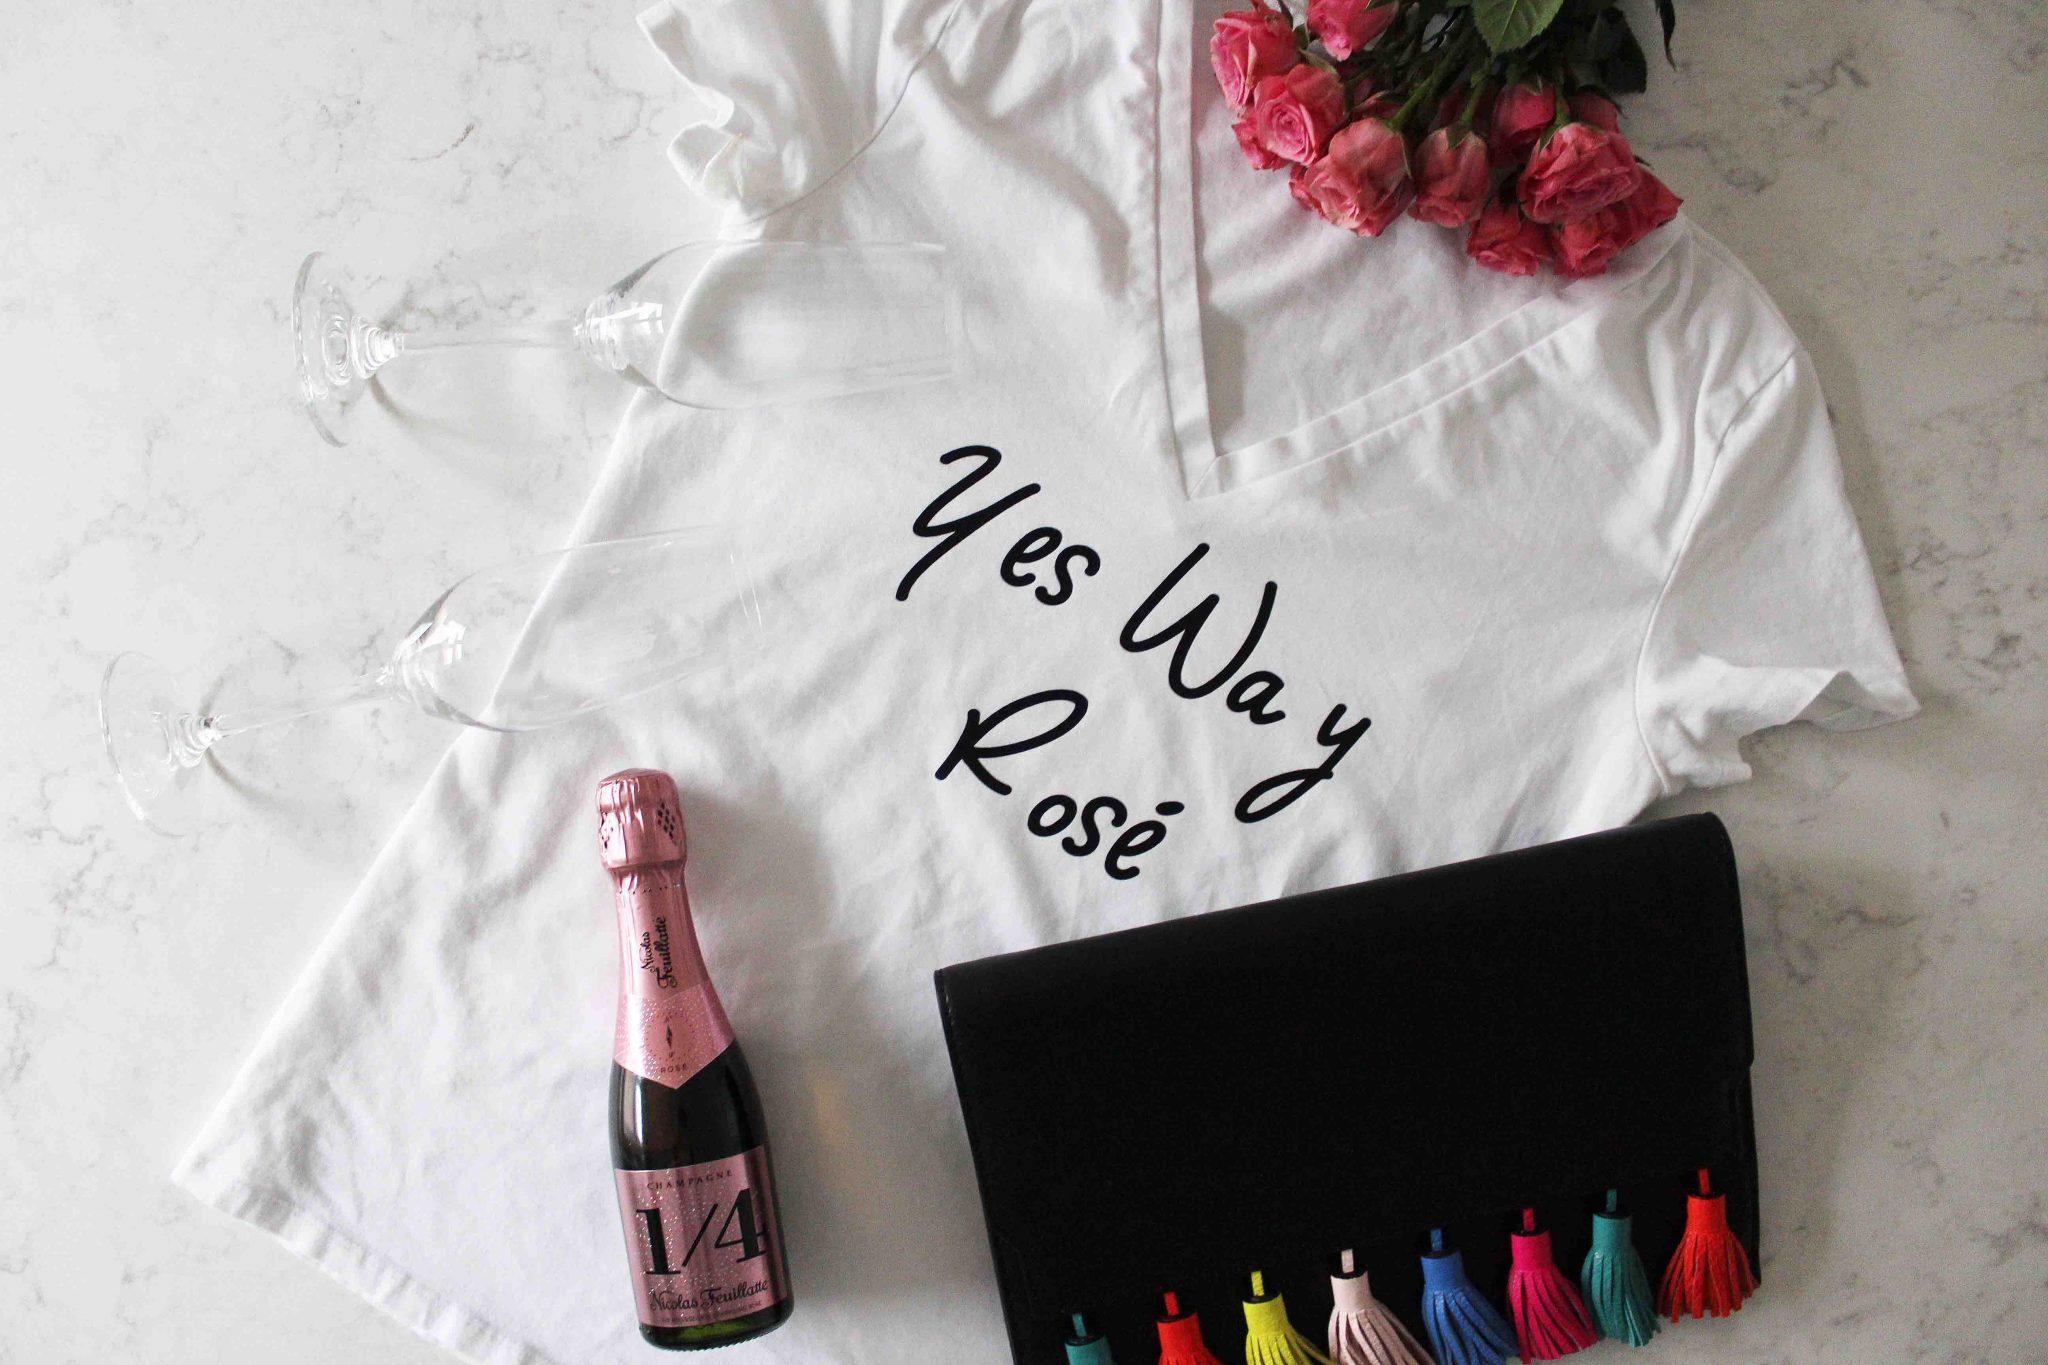 Yes Way Rose Shirt make with Cricut